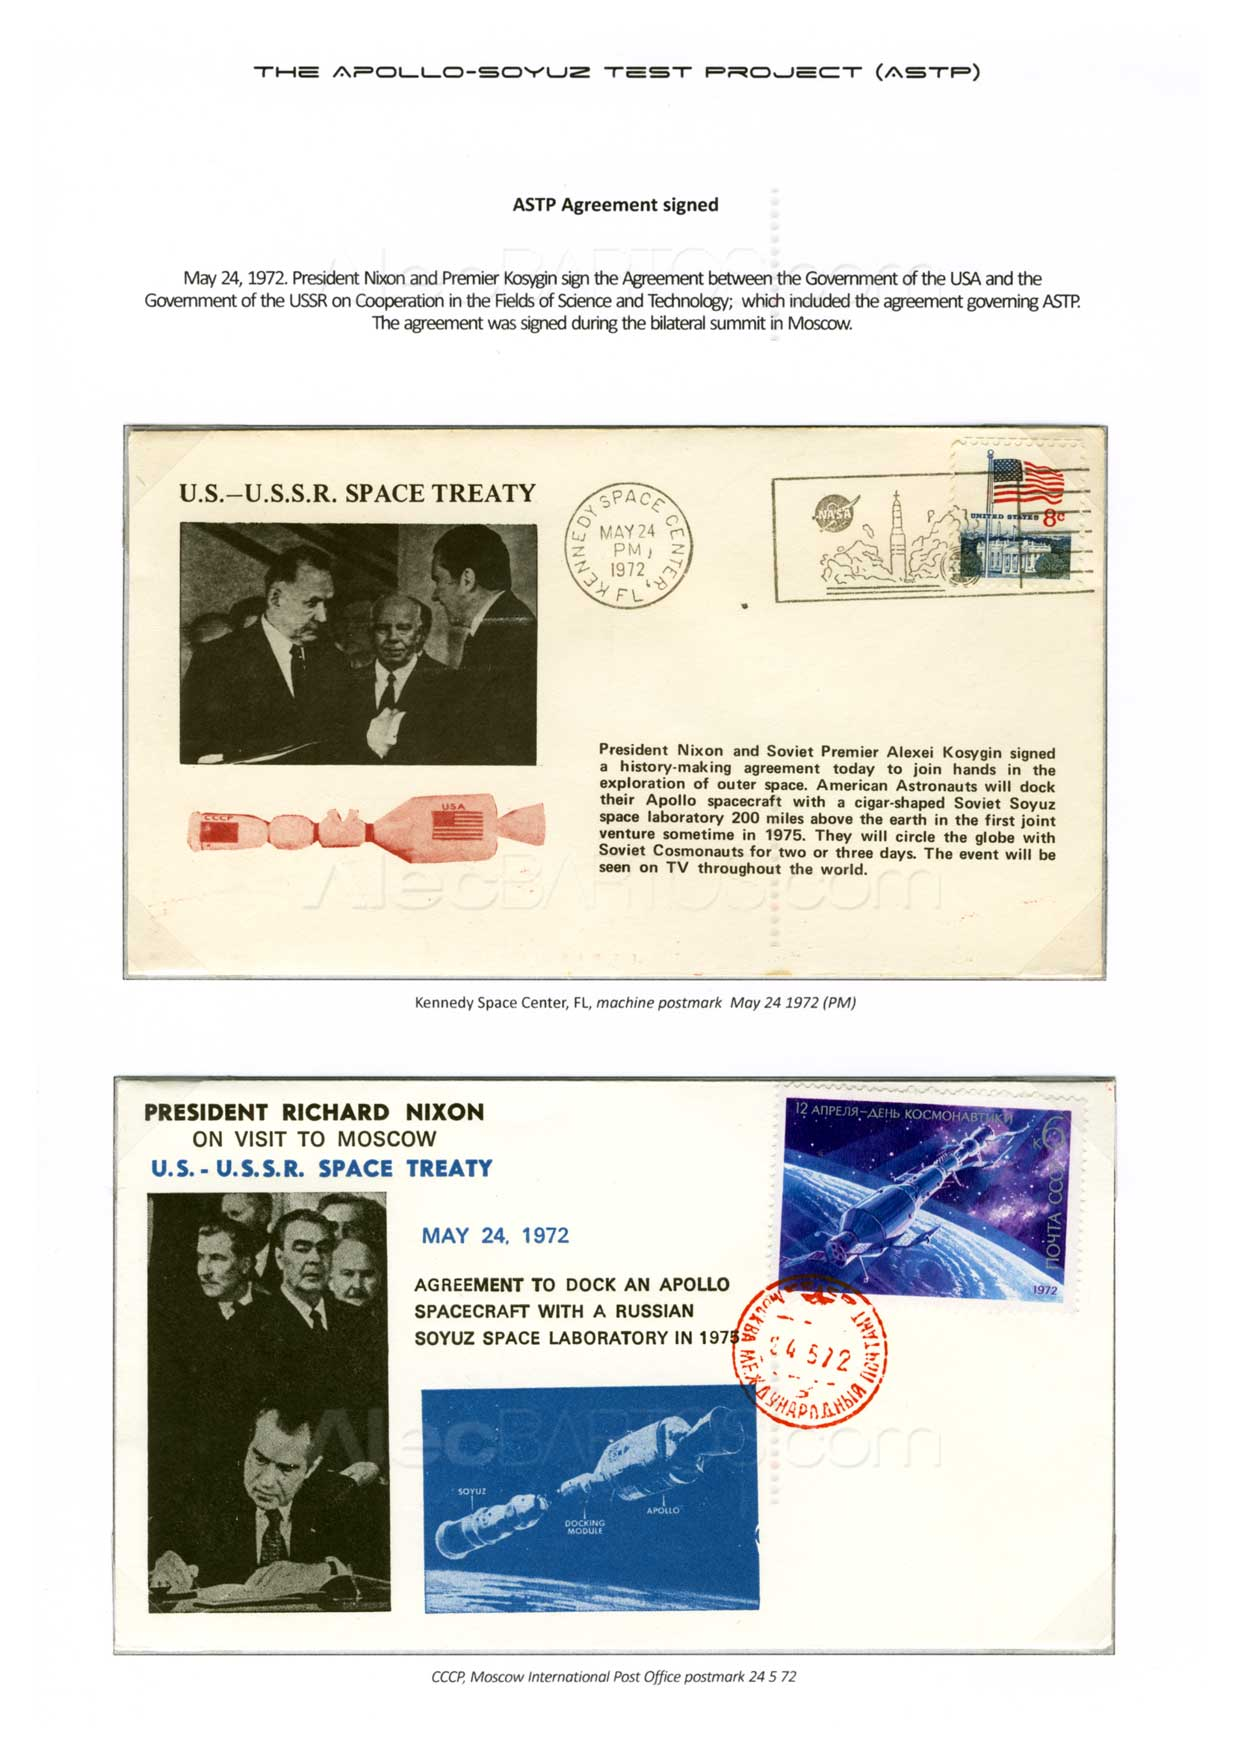 soviets_international_manned_spaceflights_alec_bartos_astp_p5-copy